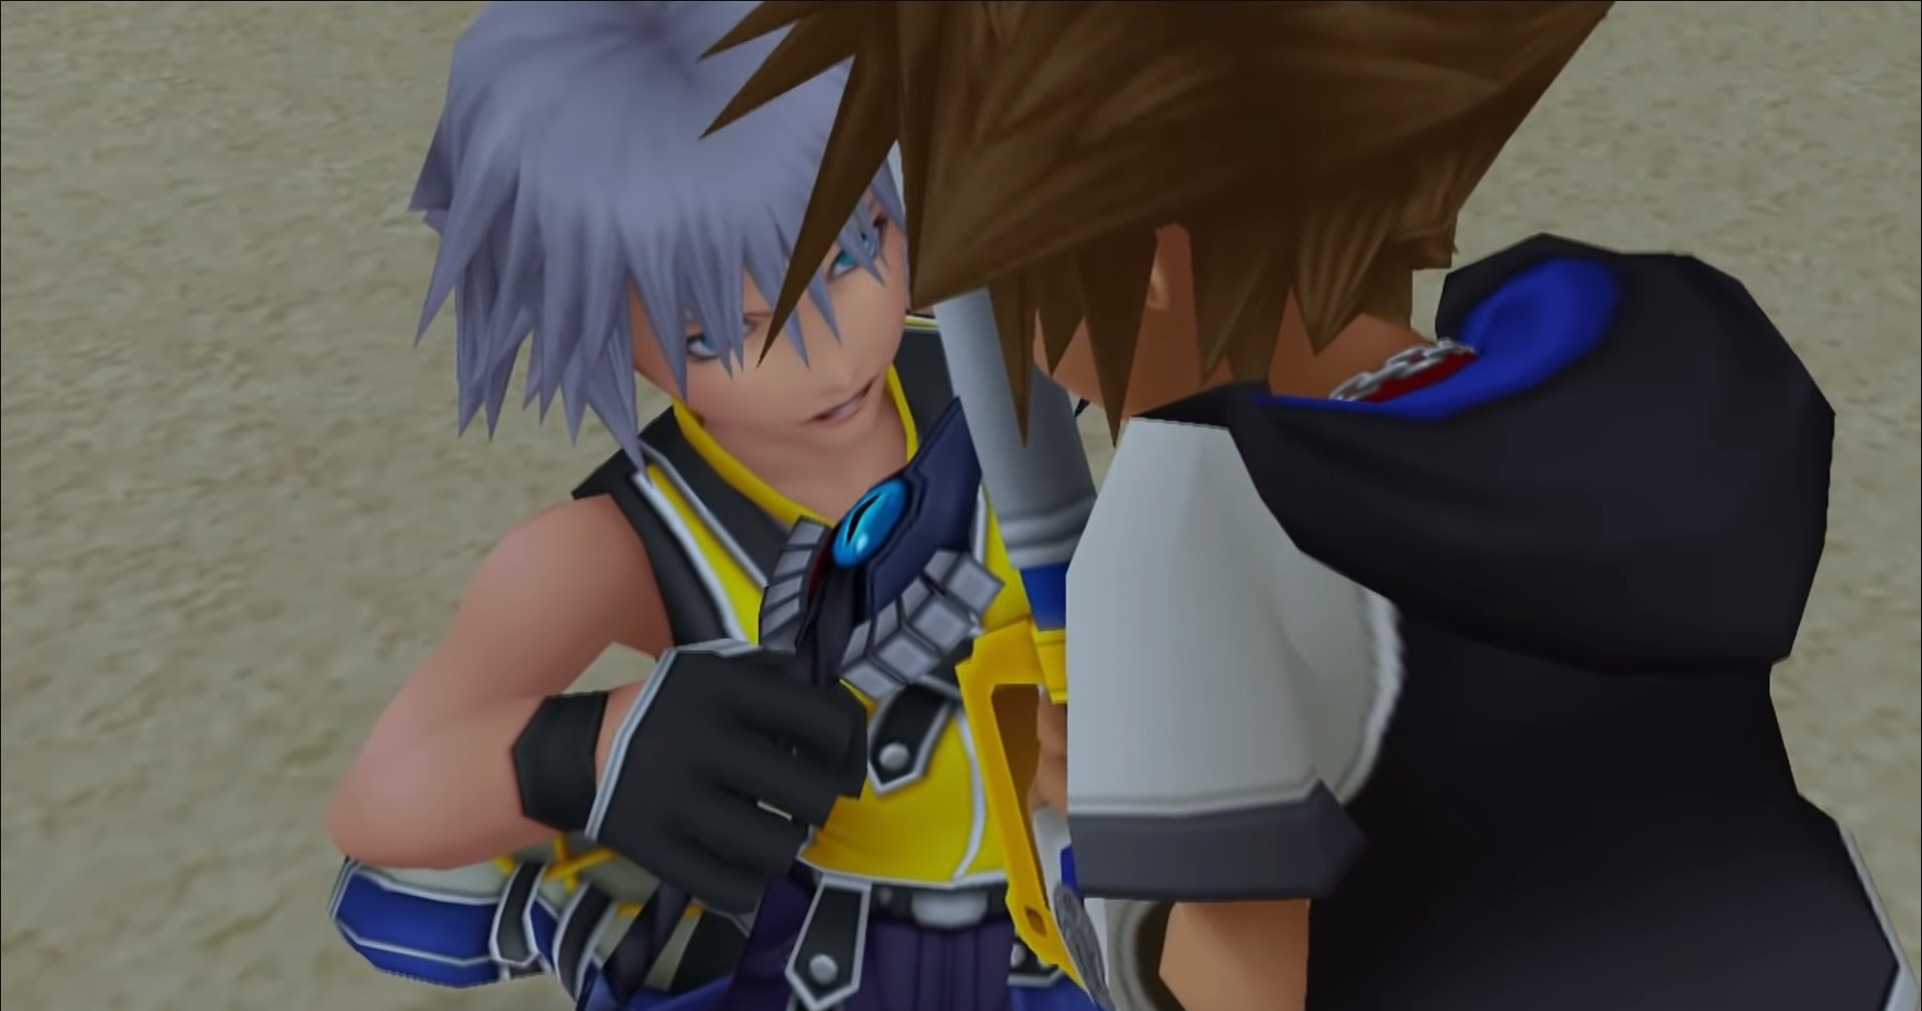 Riku combat Sora